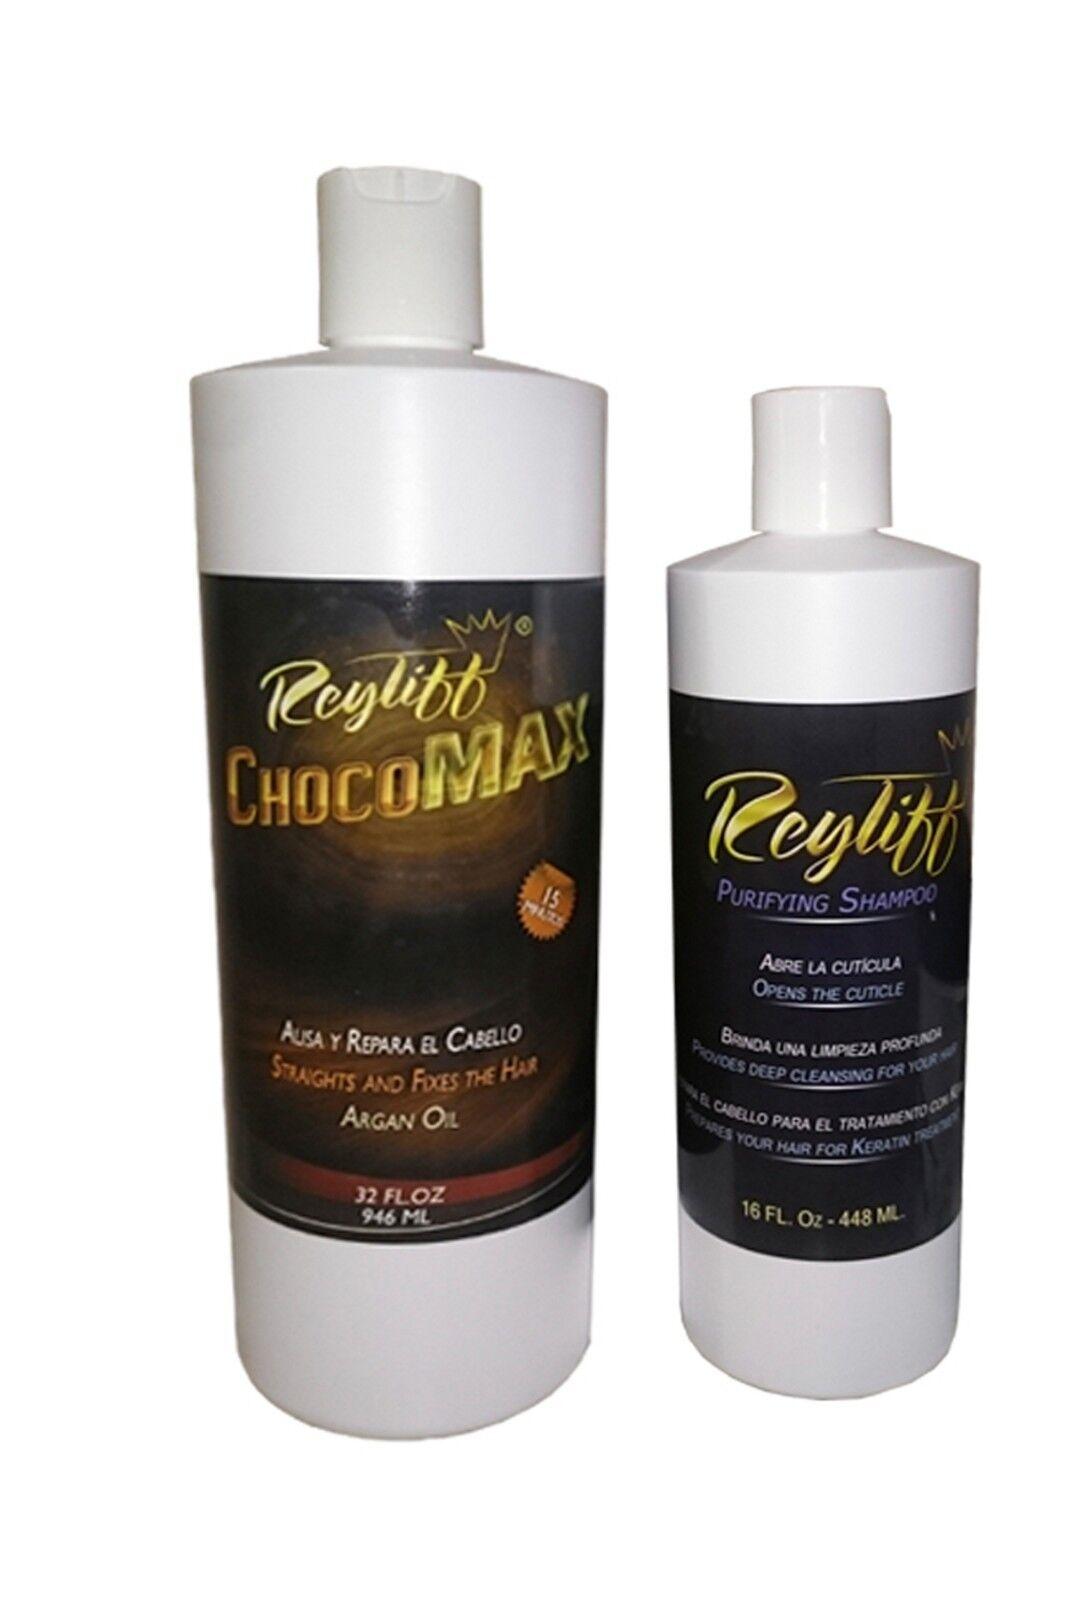 Keratin  chocomax 32 oz +16 oz purifying champoo